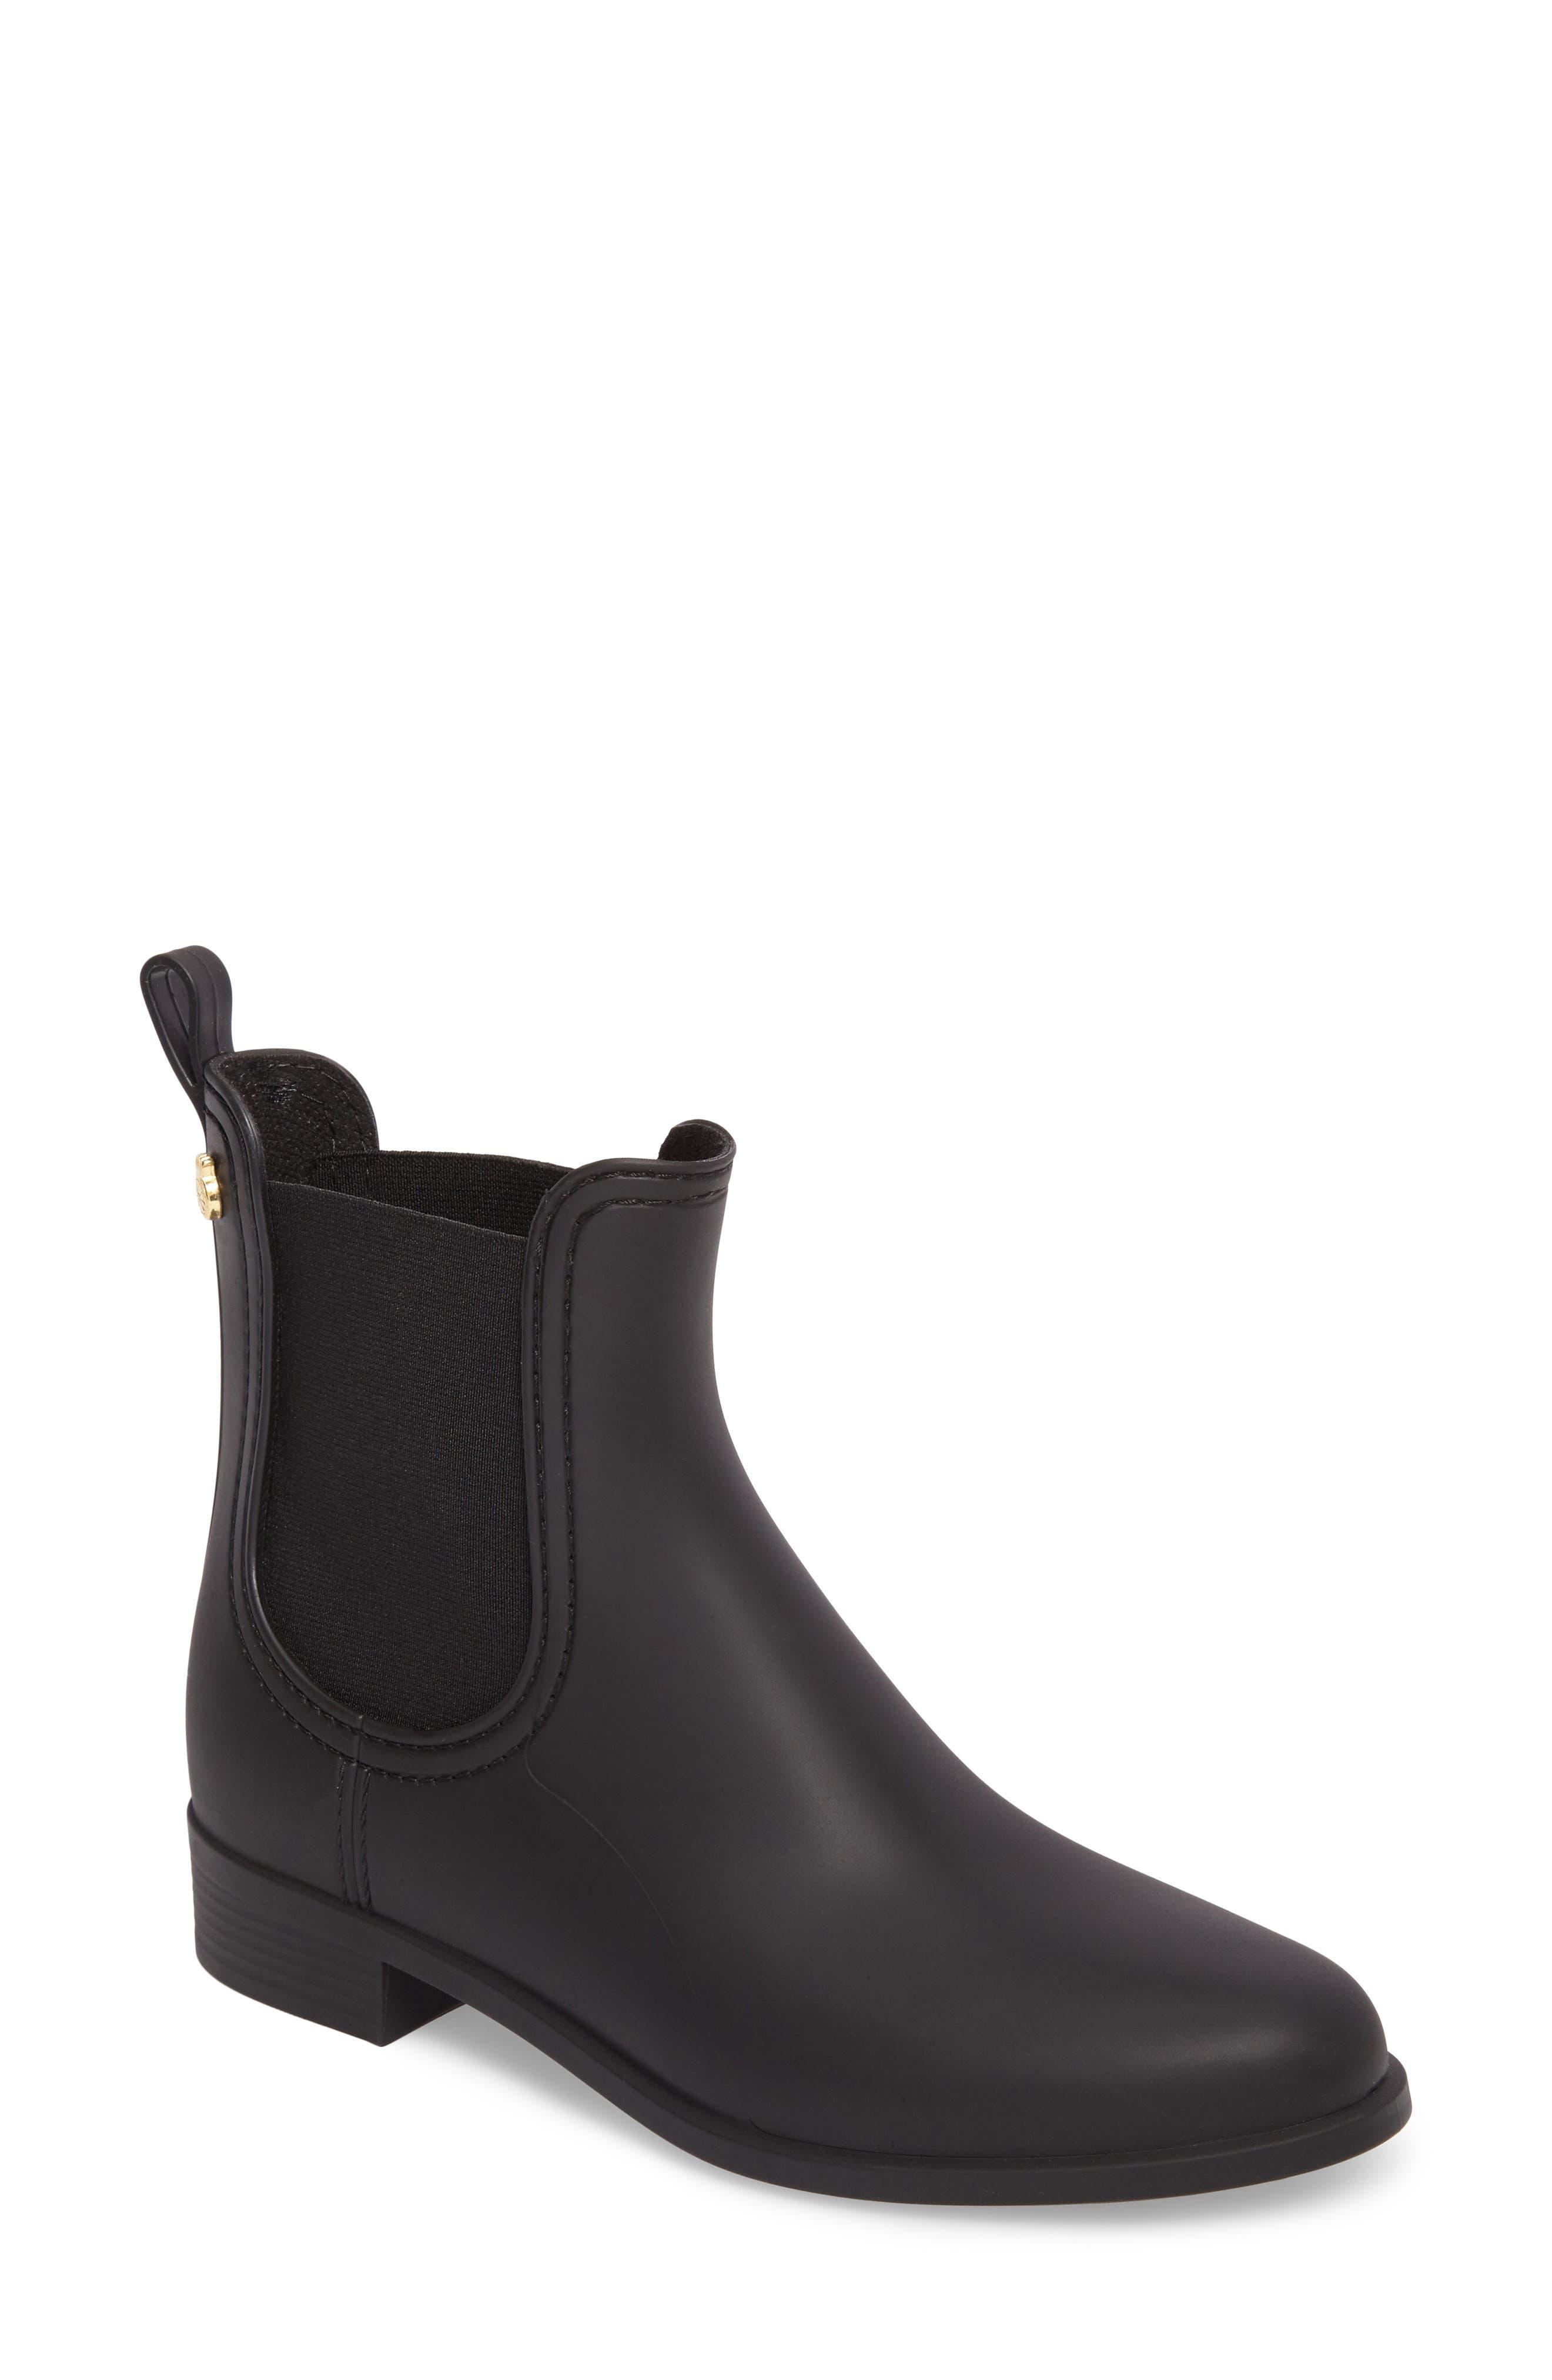 Splash Waterproof Chelsea Boot,                         Main,                         color, 002